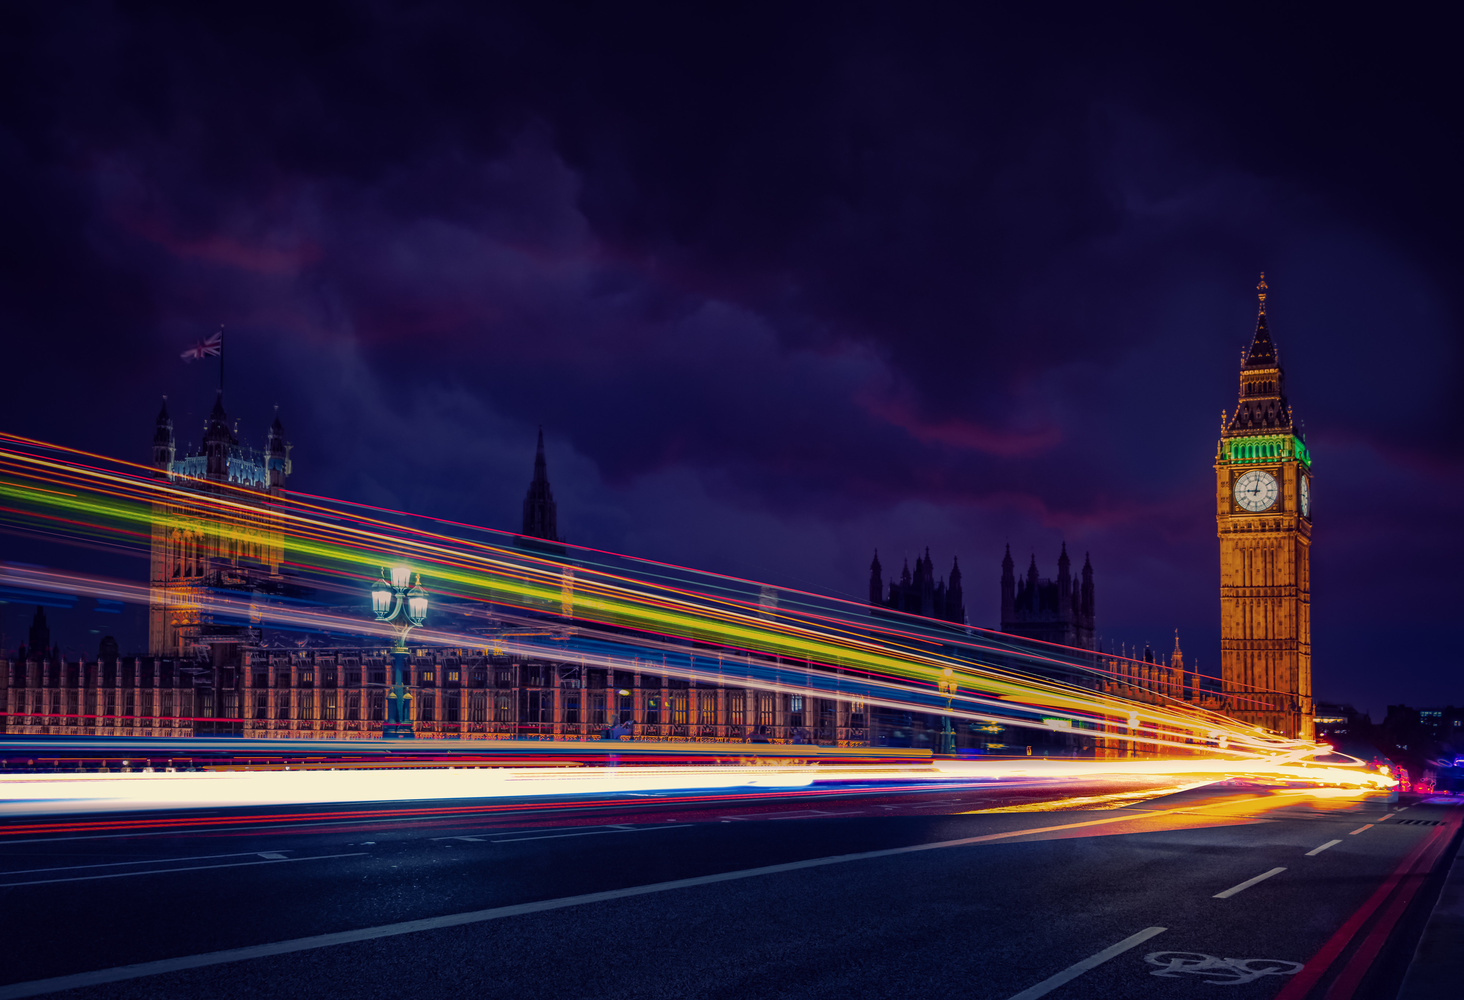 Fast Lane by Alex Hill